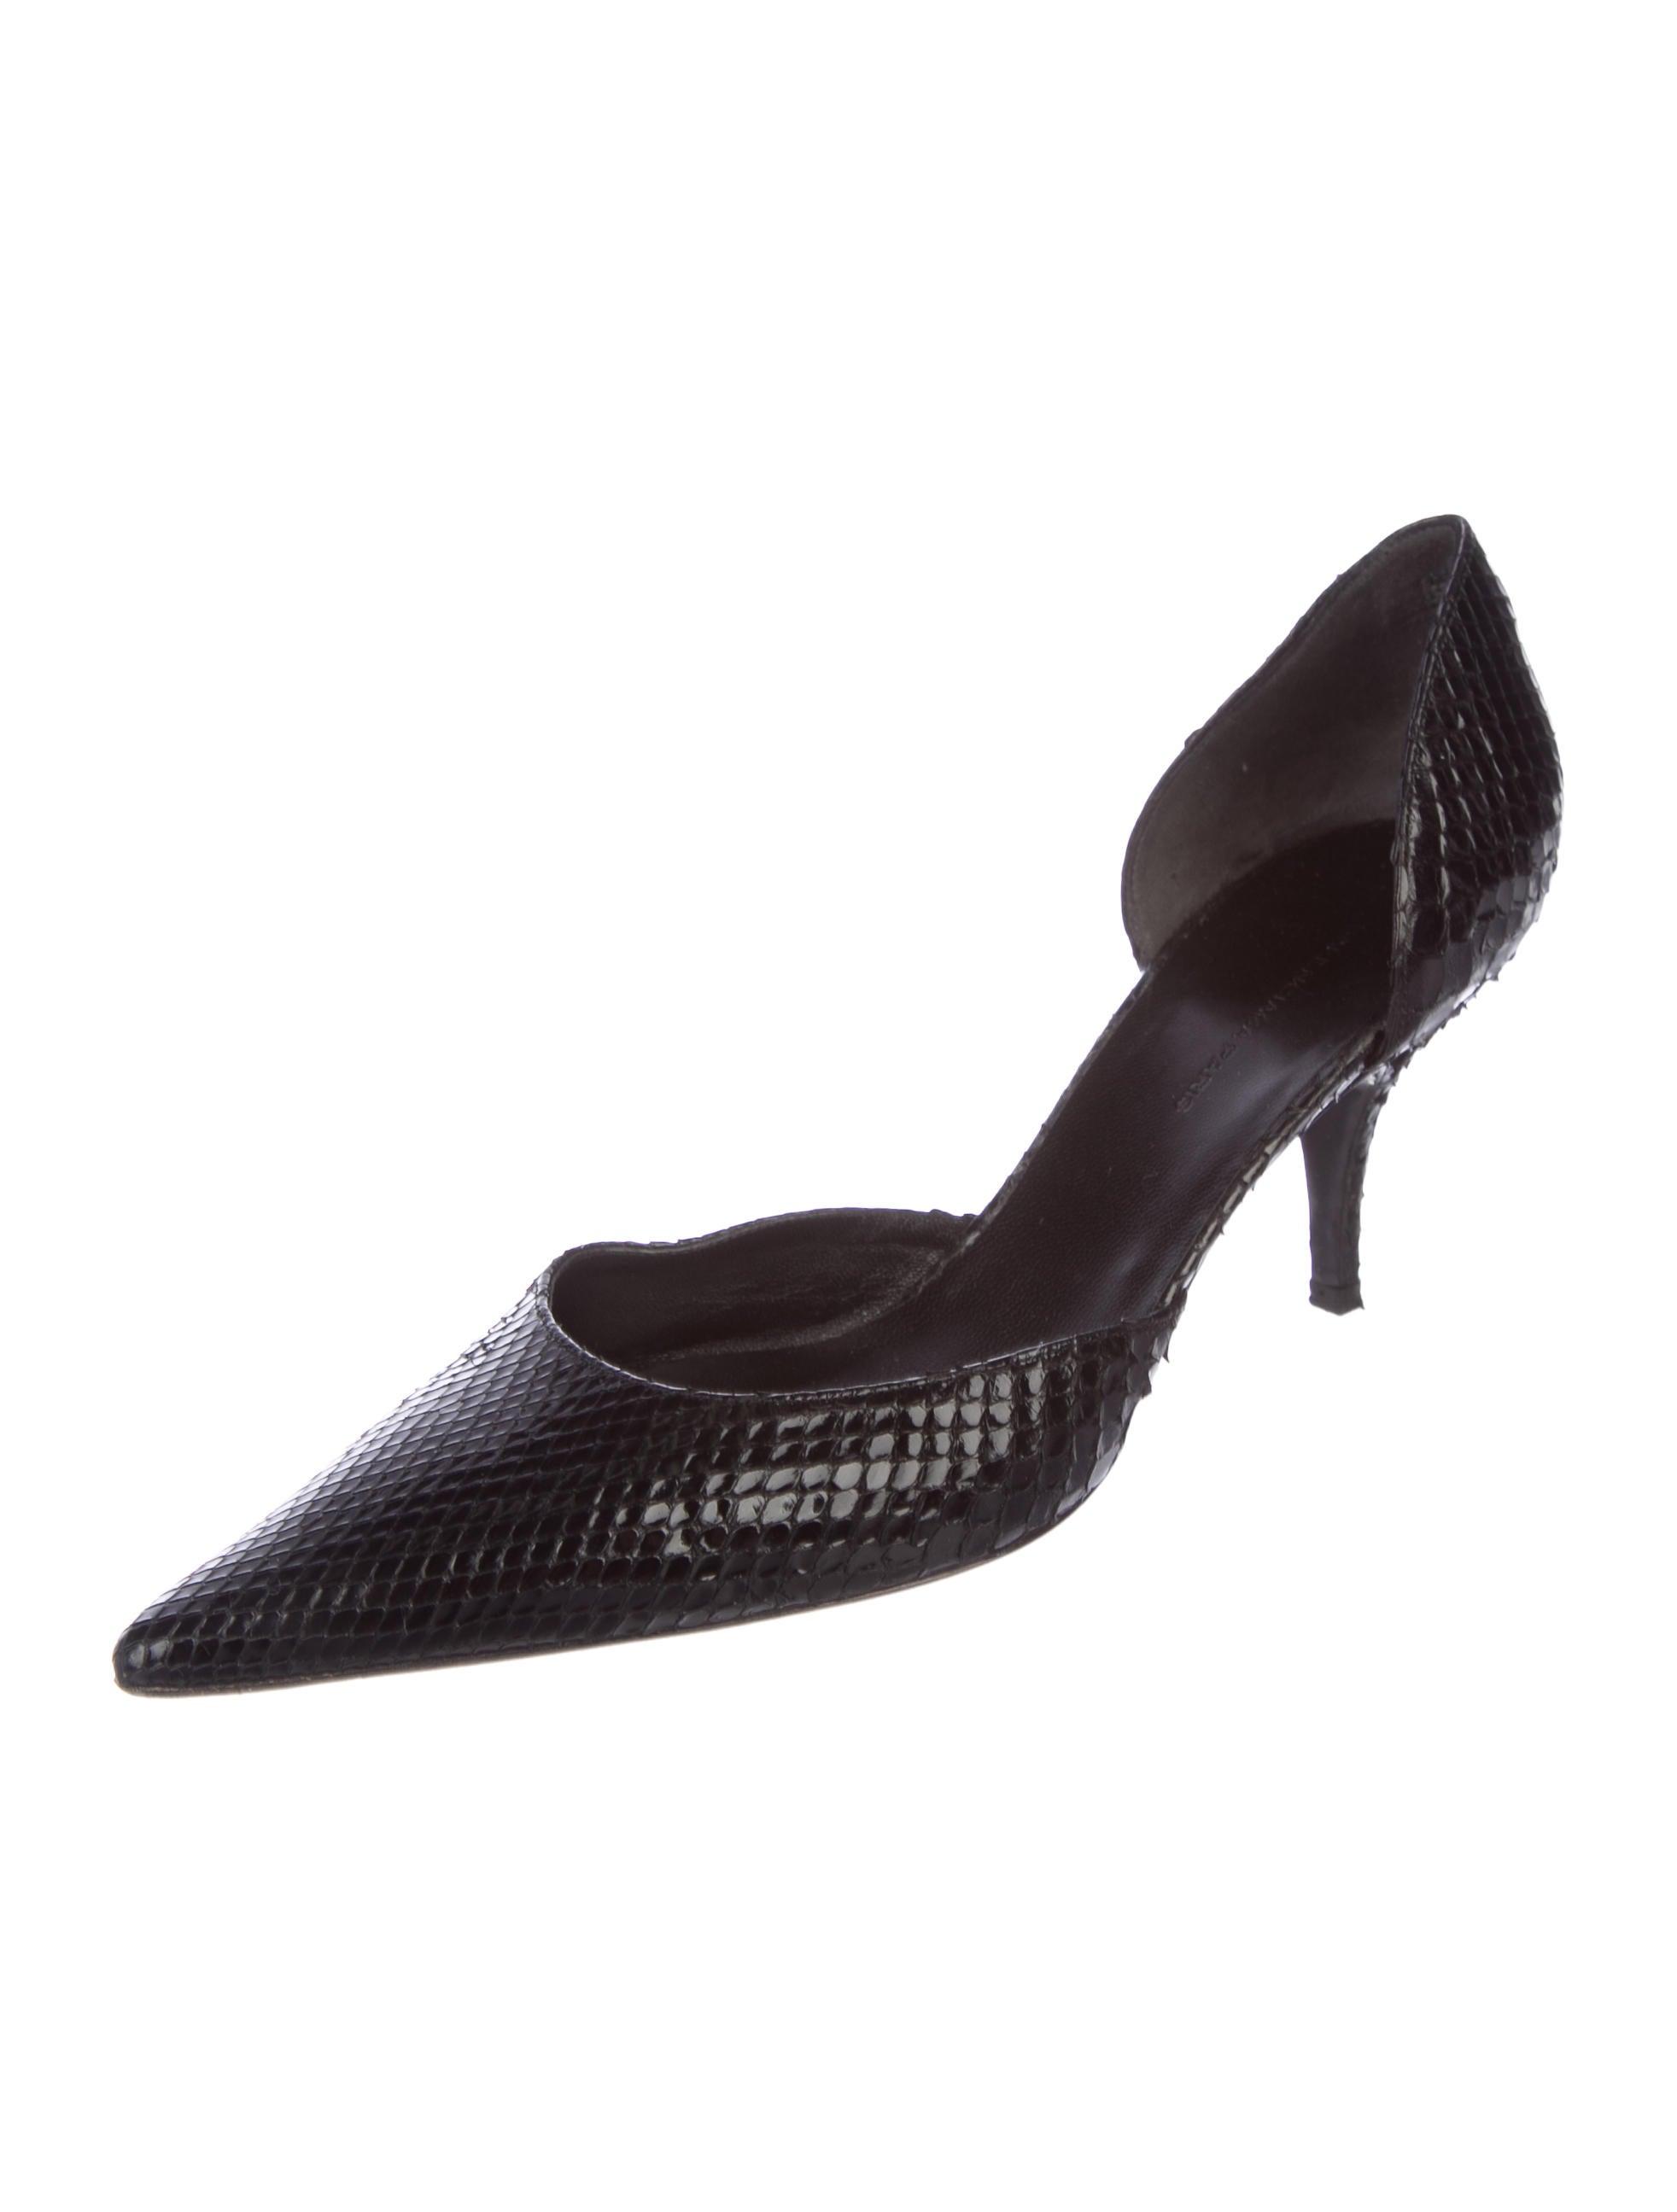 Balenciaga Snakeskin D'Orsay Pumps 100% original cheap online Y8w5B